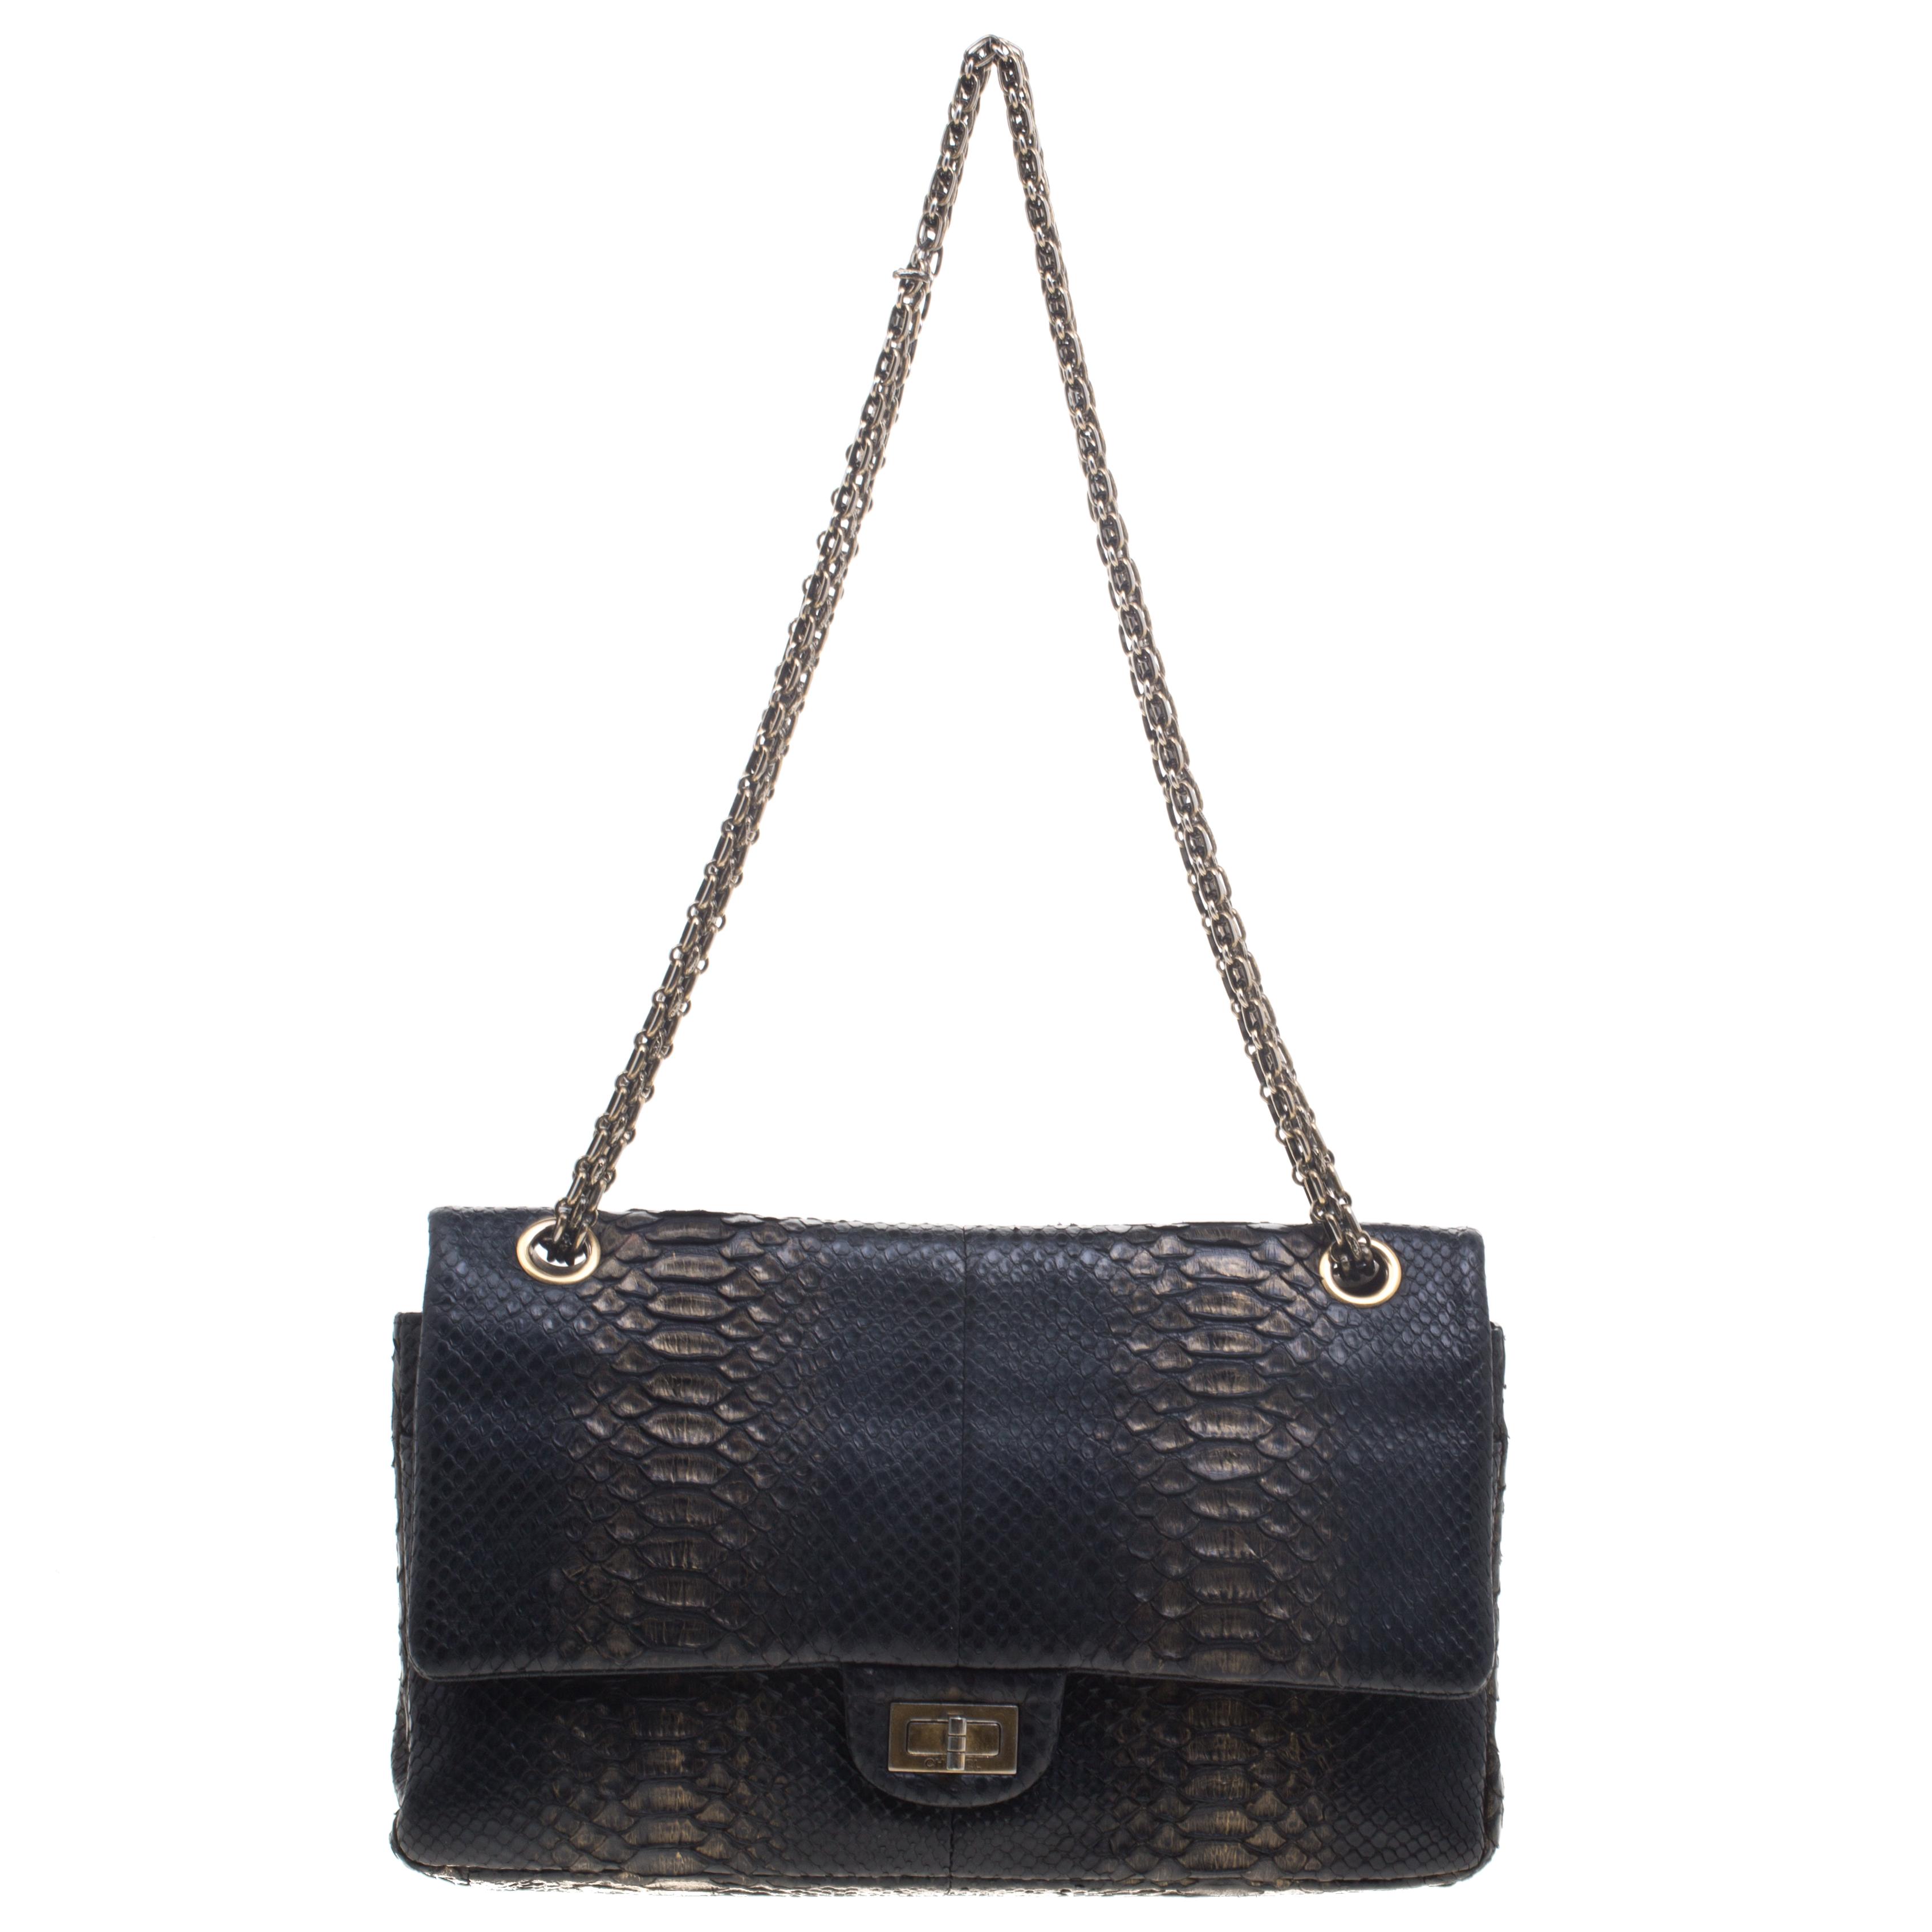 1bdee12da2d0 Chanel Teal Python Sensual CC Clutch Bag. attractive price c5216 57a31 Buy  Chanel Metallic BlackGold Python Reissue 2.55 Classic 22 ...